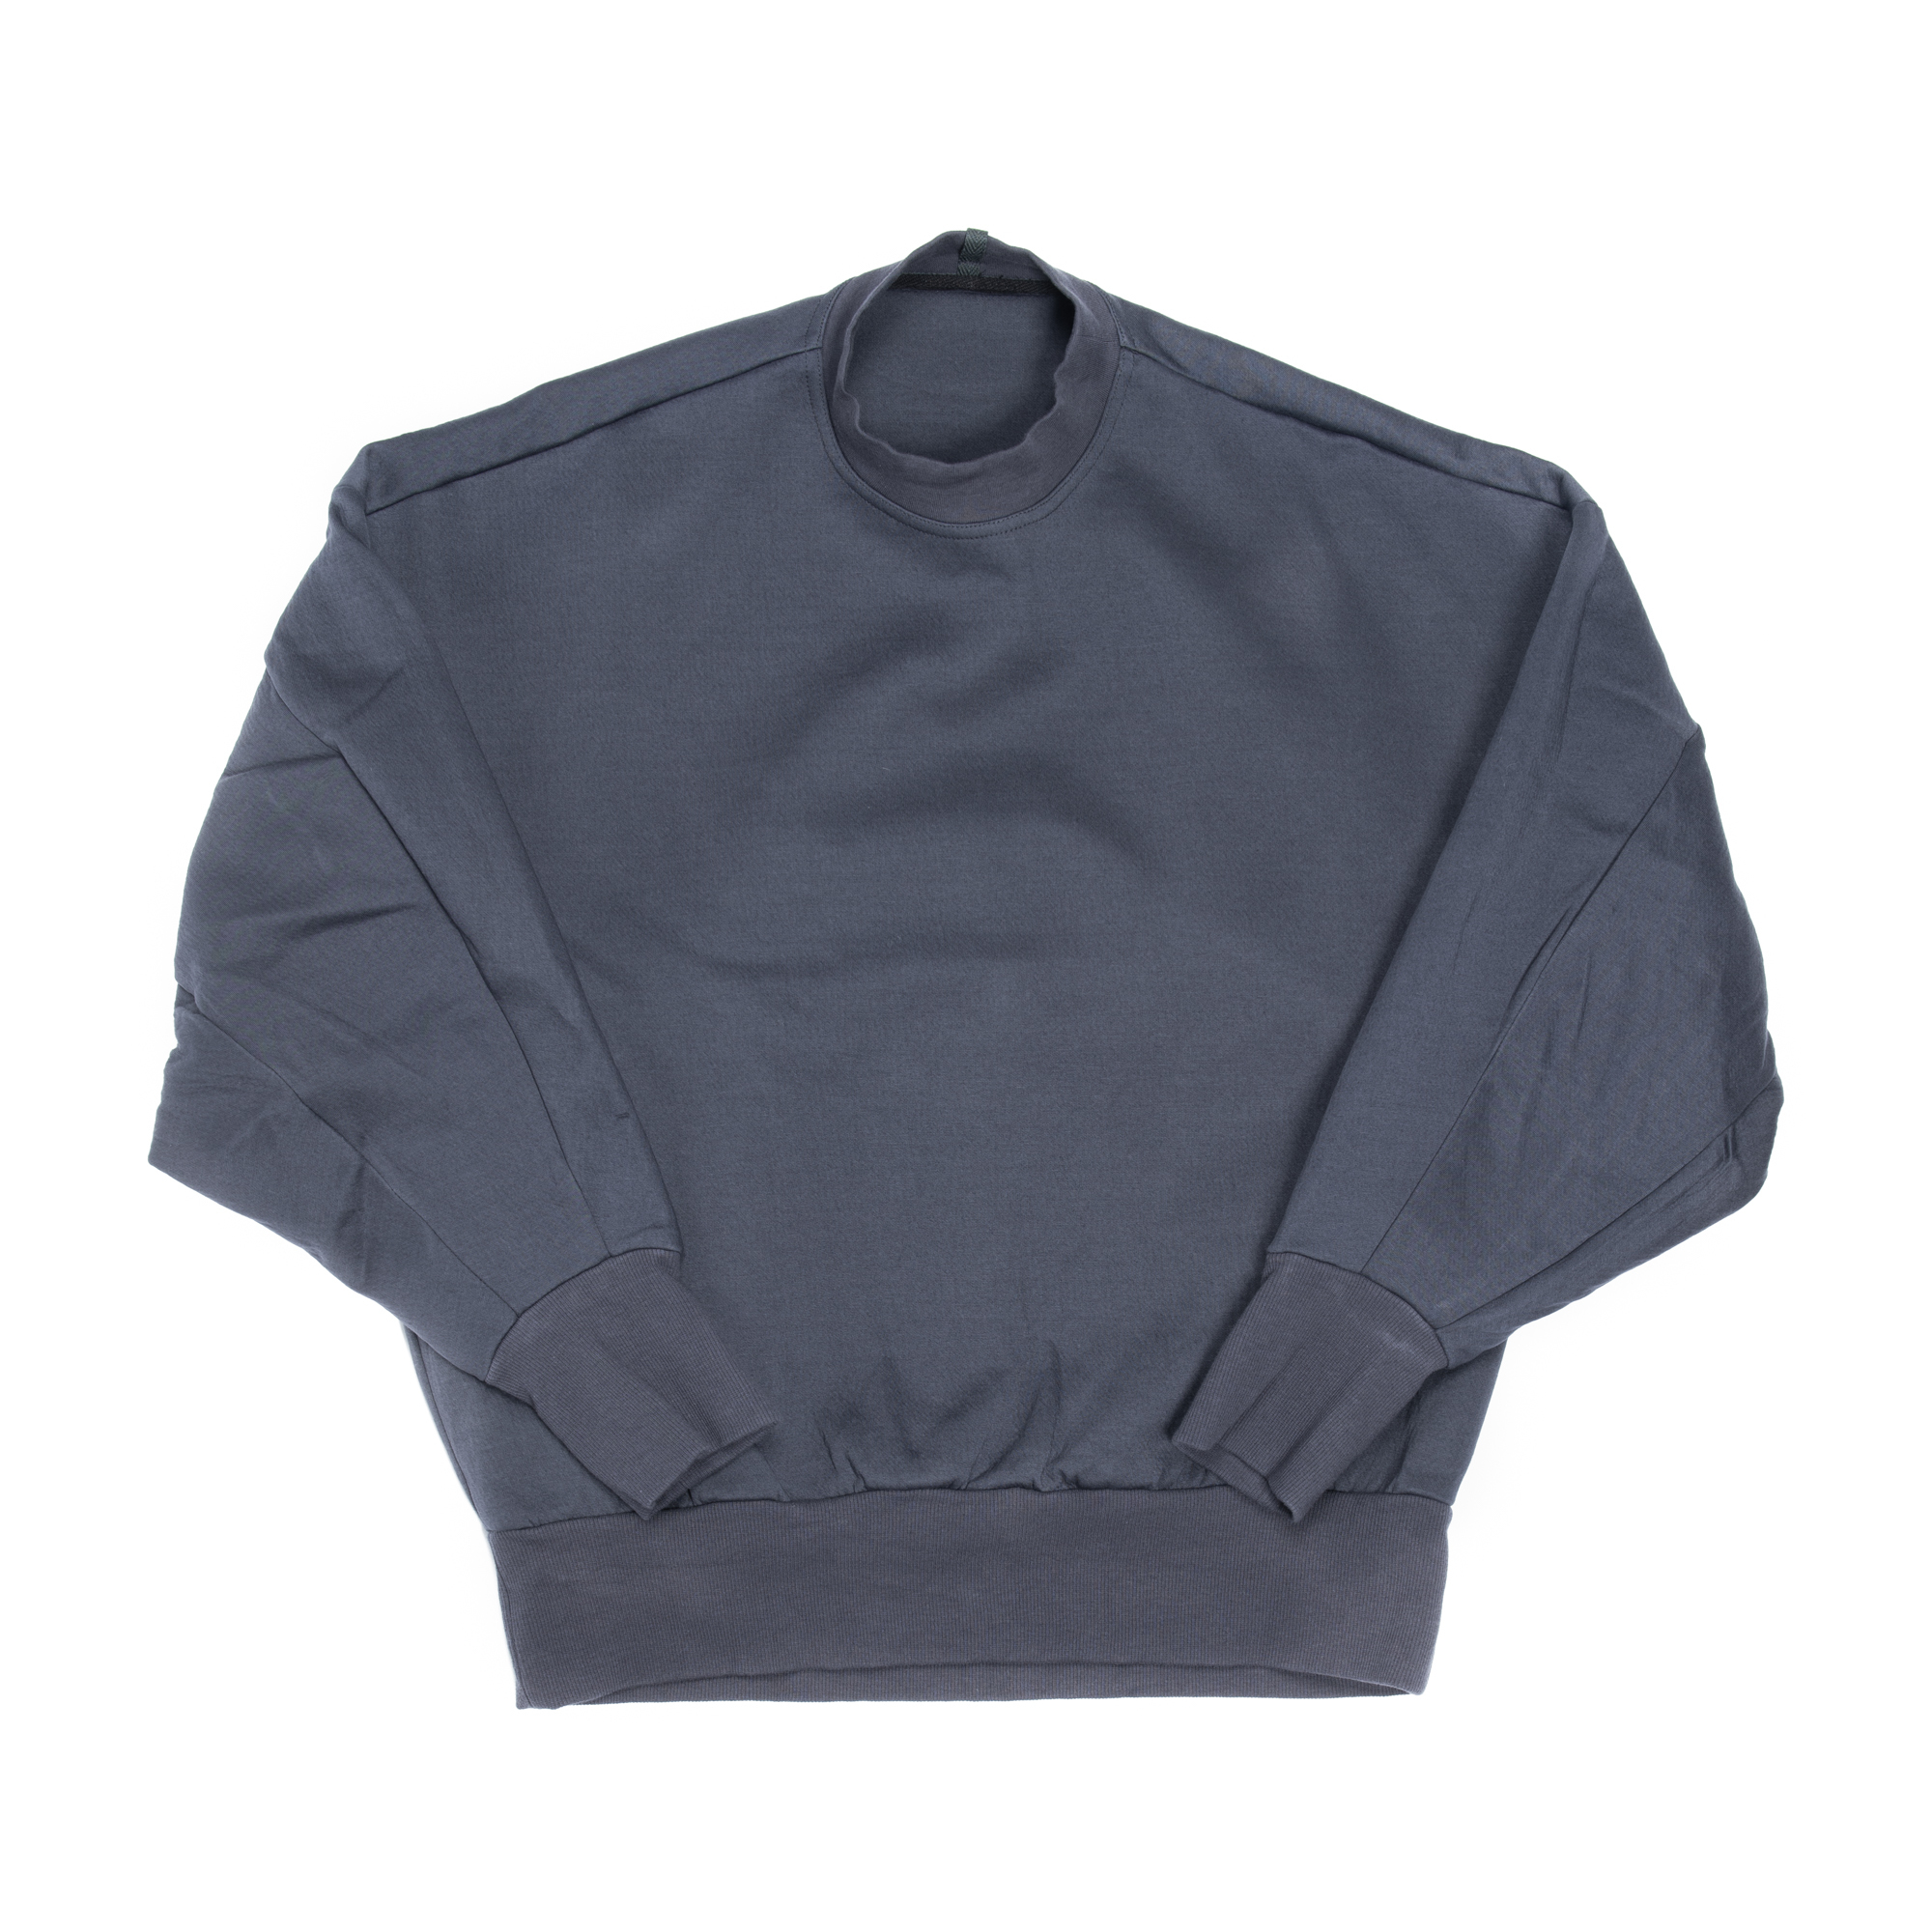 657CUM2-BLUE GRAY / バックストラップ スウェットシャツ